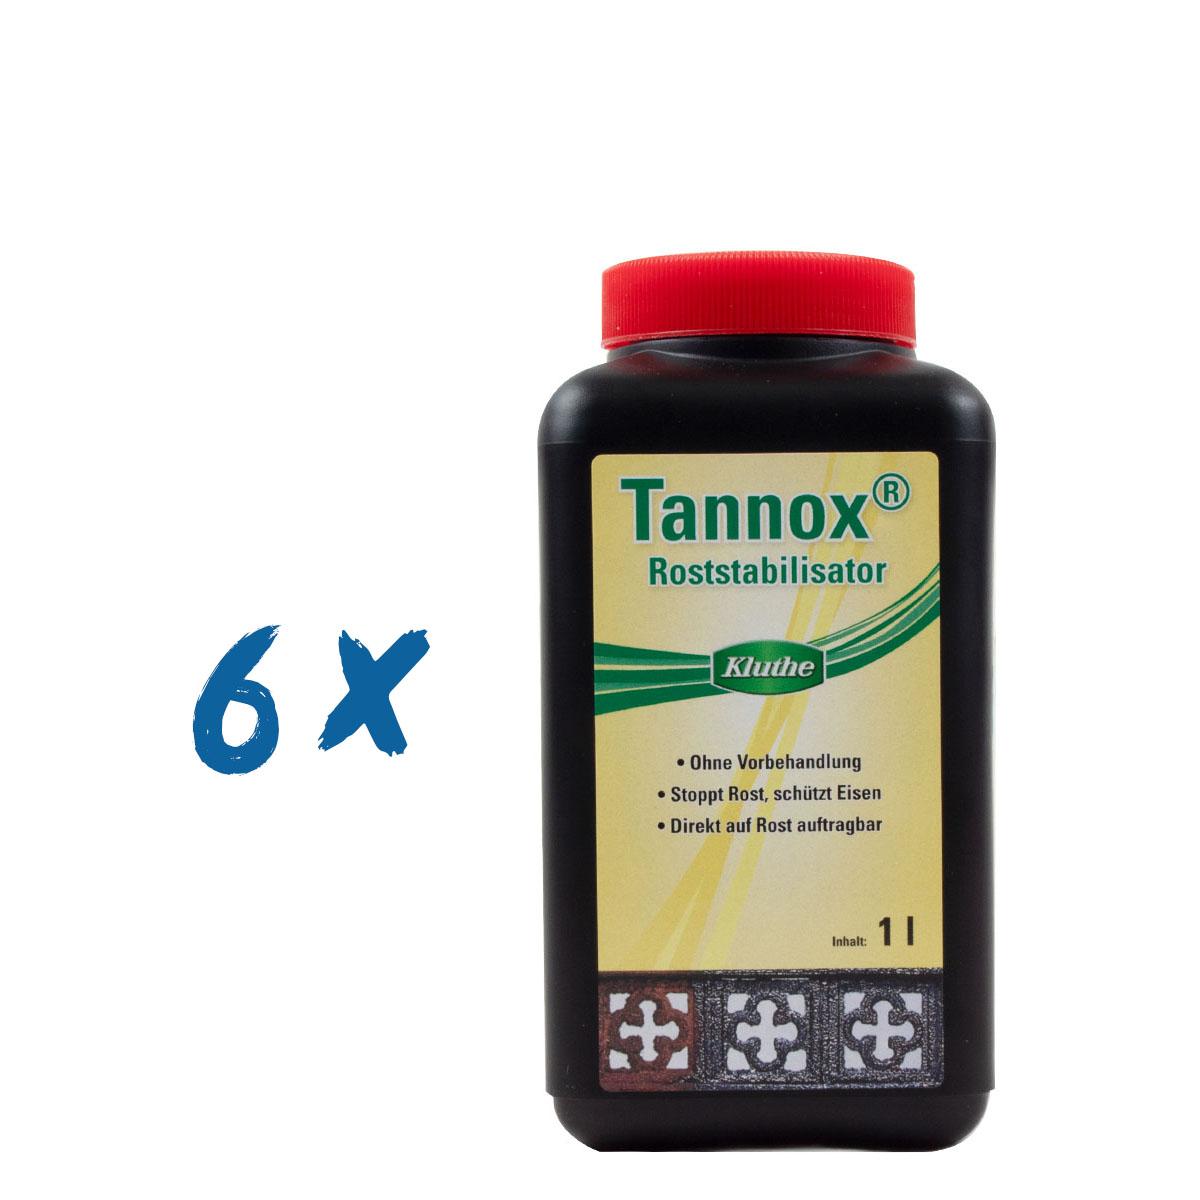 6 x Kluthe Tannox 1L Roststabilisator, Rostumwandler